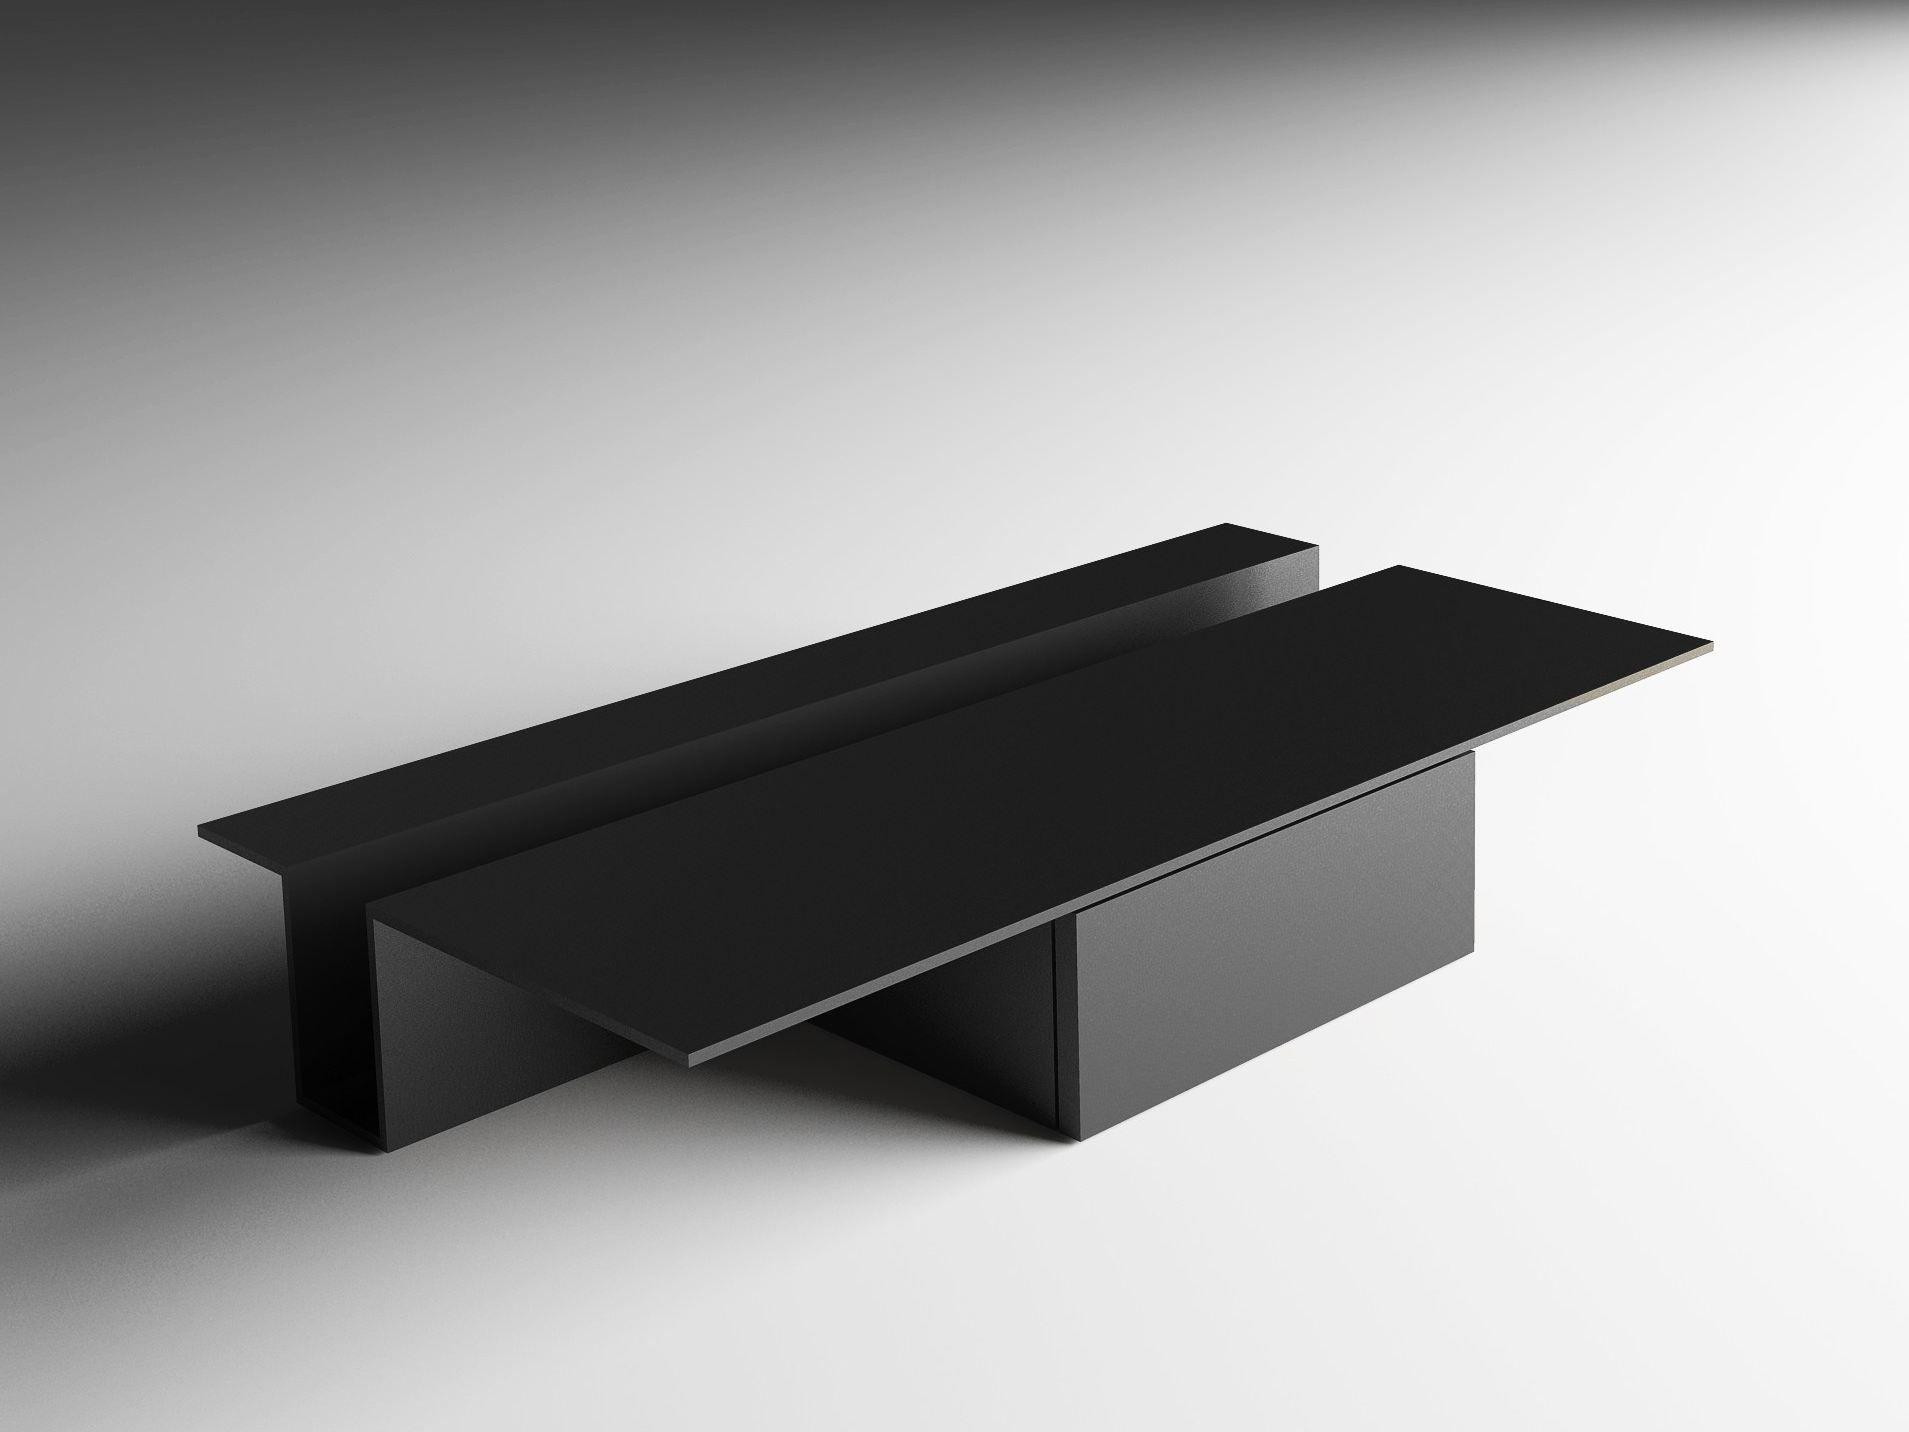 58f826b3337eb0e8277e88da90e5dde0 Luxe De Mini Table Basse Concept